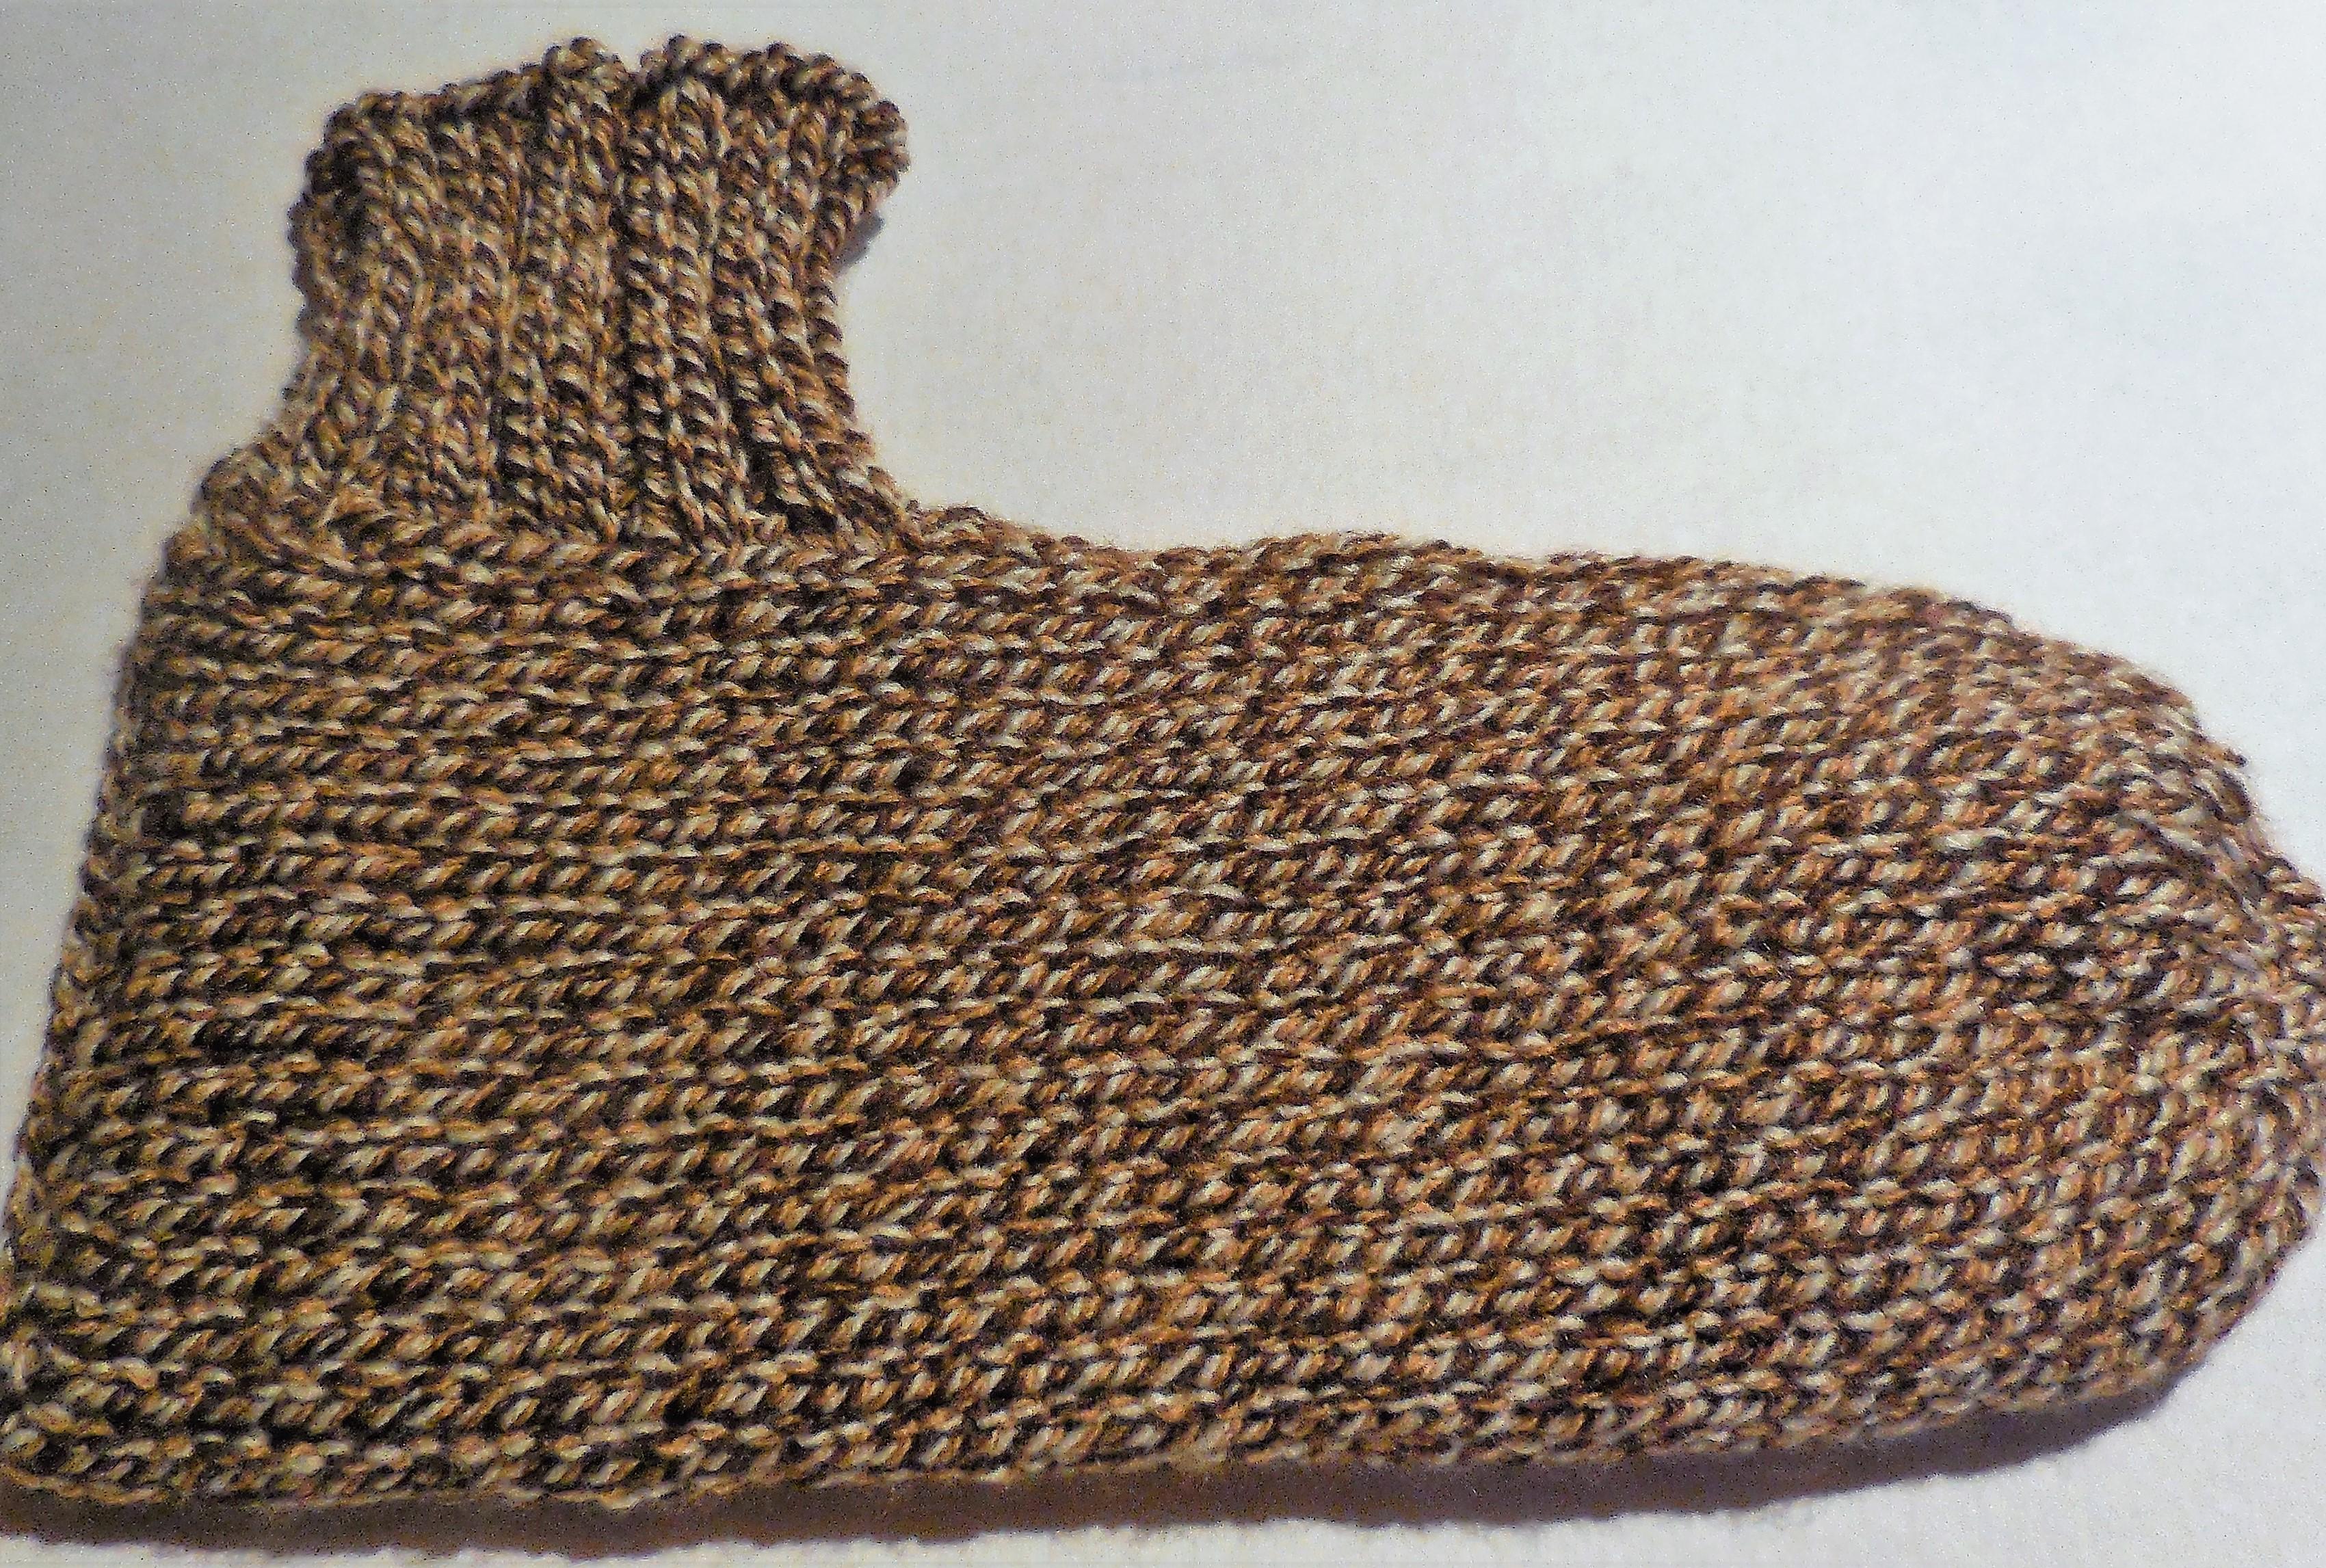 Bettsocken handgestrickt , original Tösstal-Design